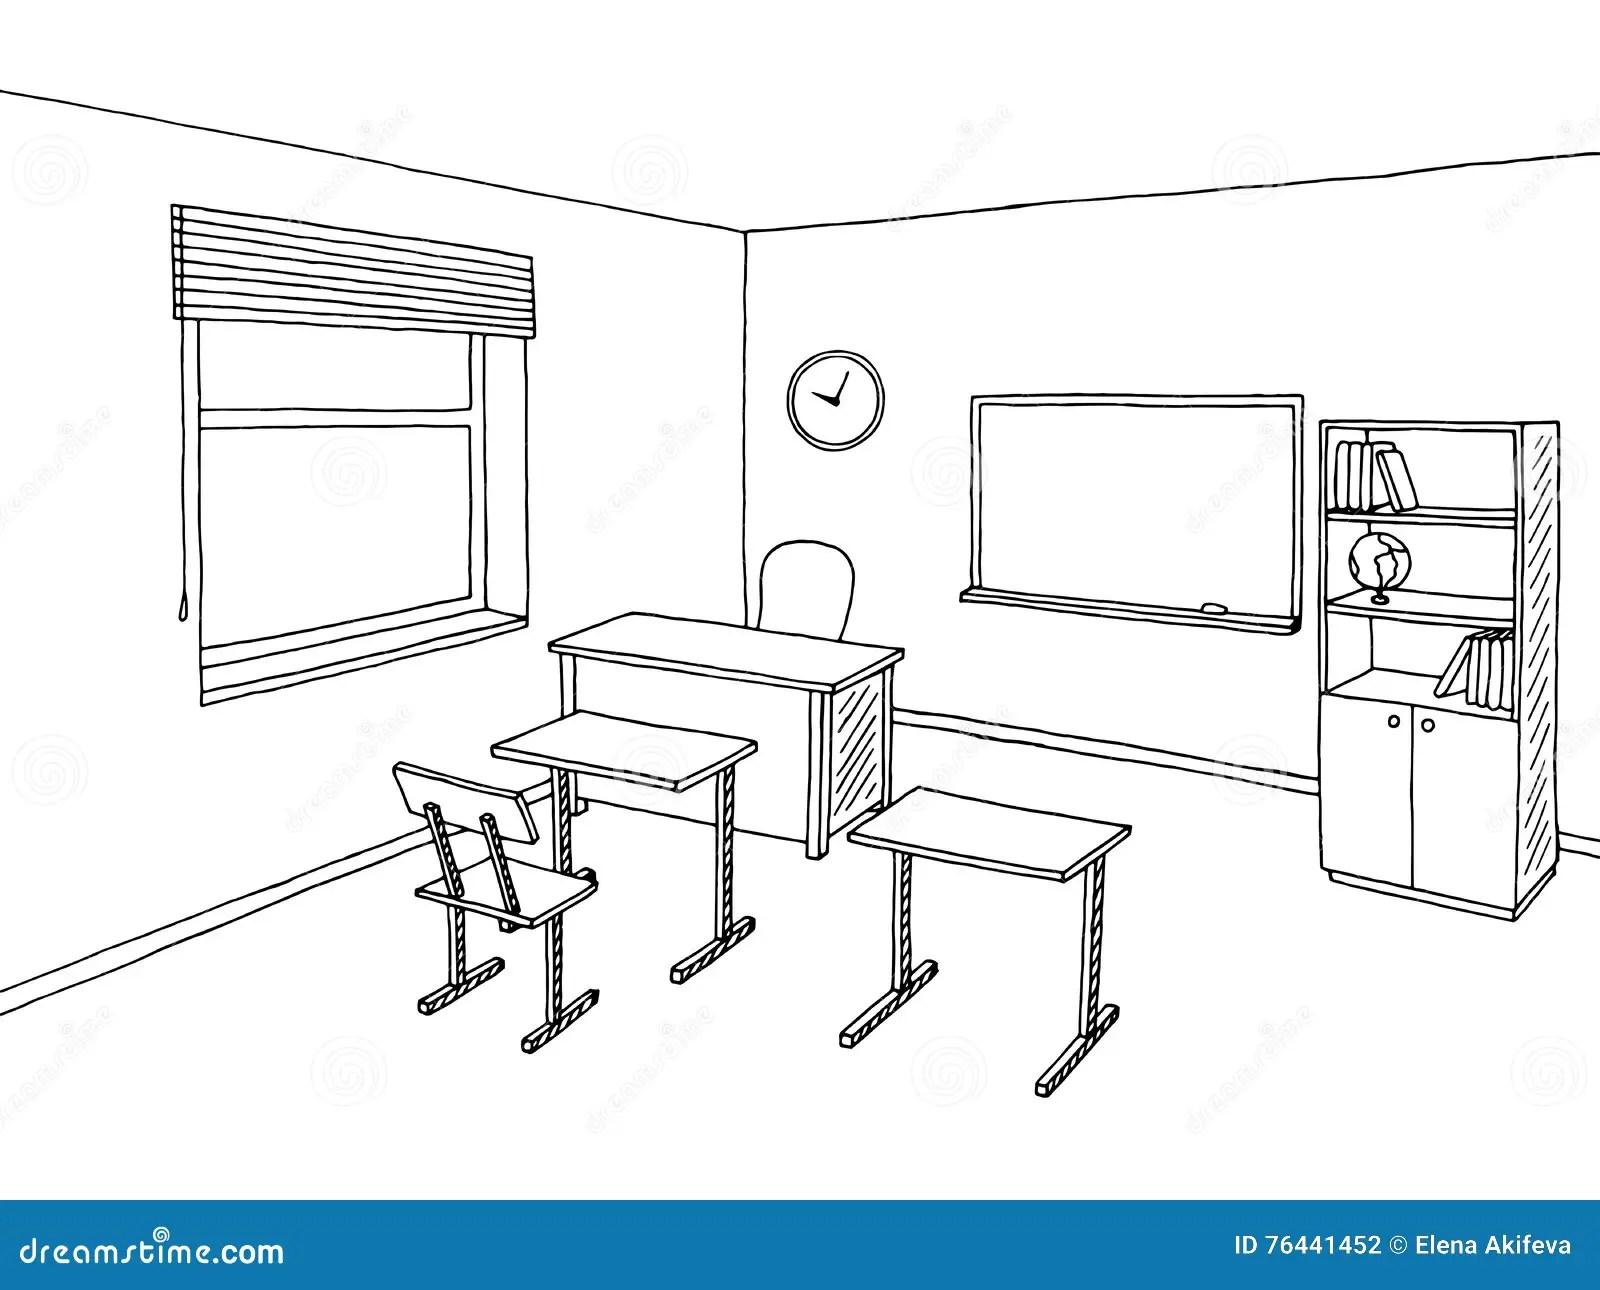 School Classroom Black White Graphic Art Interior Sketch